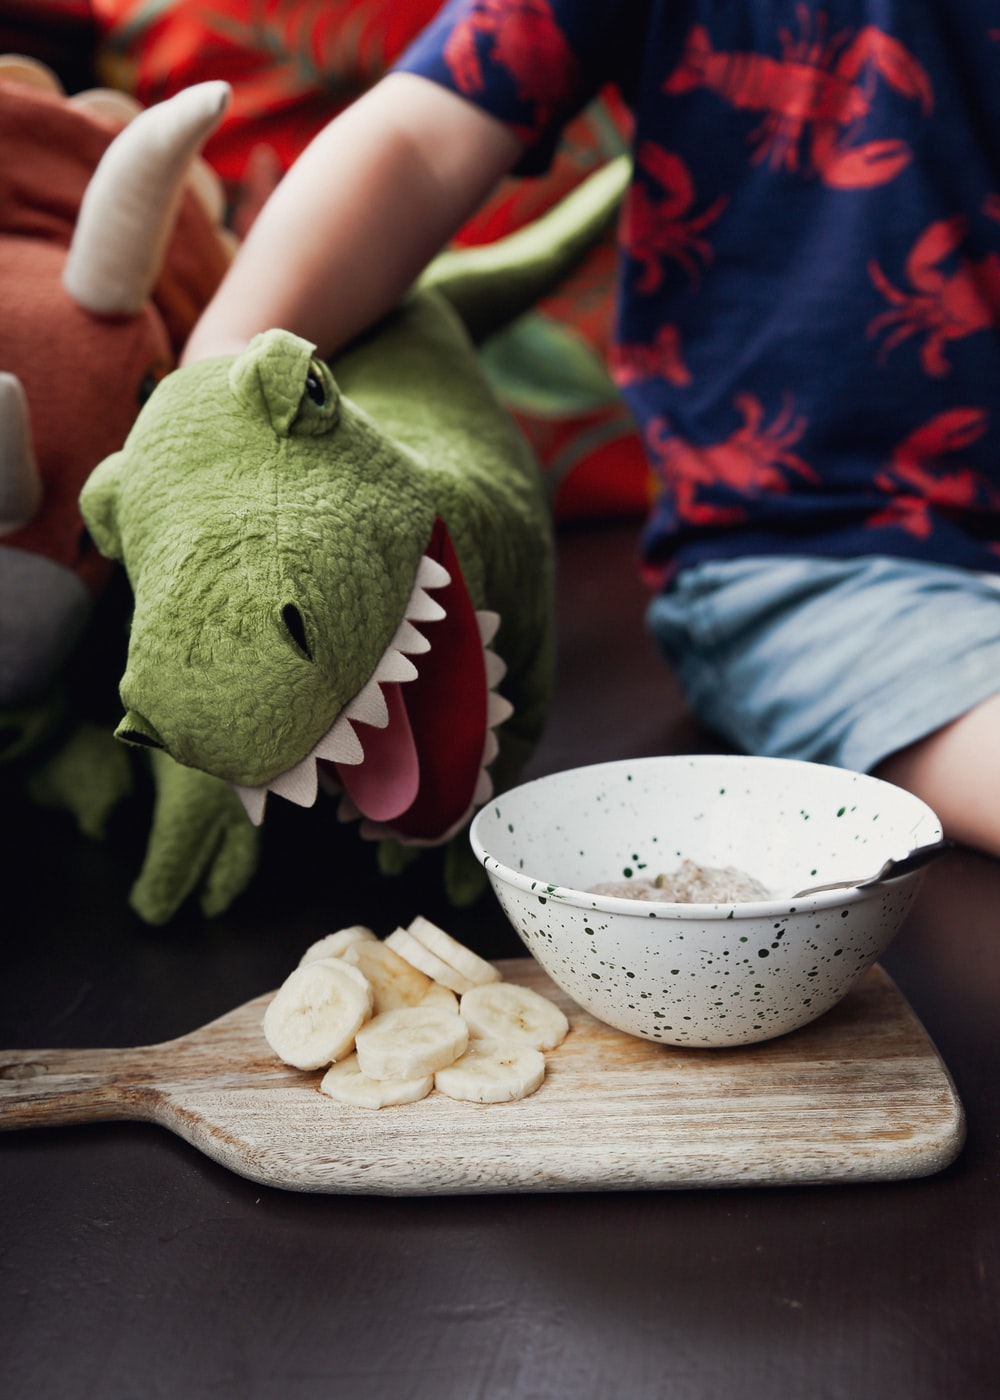 green frog plush toy beside white ceramic bowl